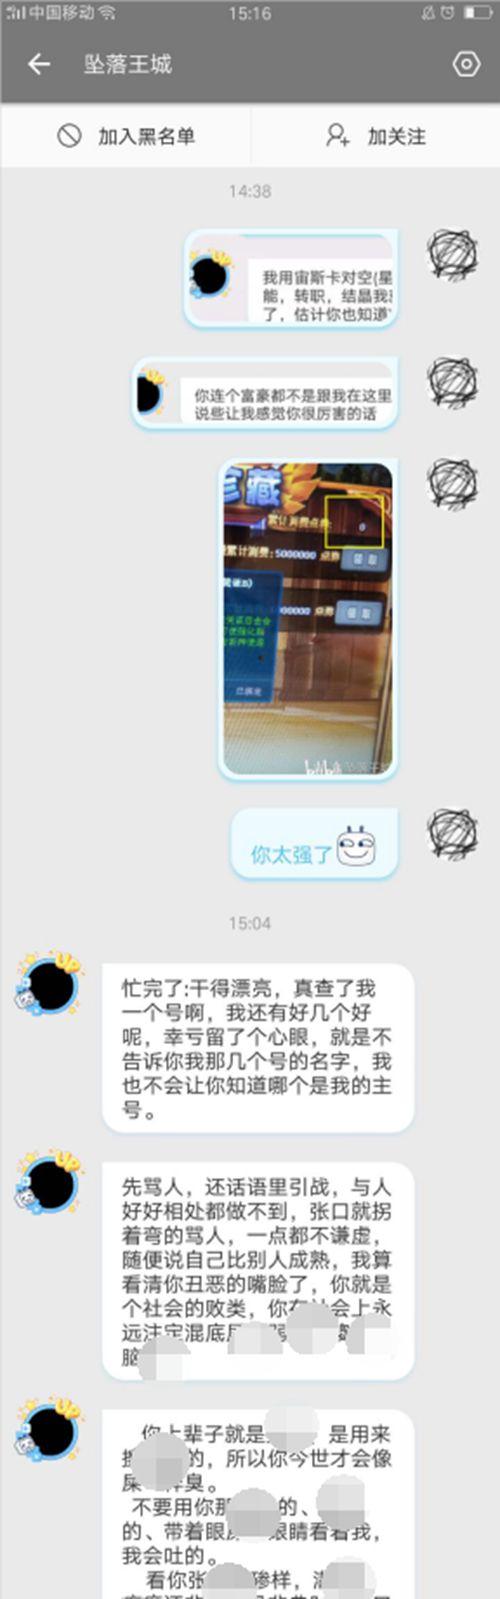 某upの羊城晚报(完善版)_WWW.XUNWANGBA.COM